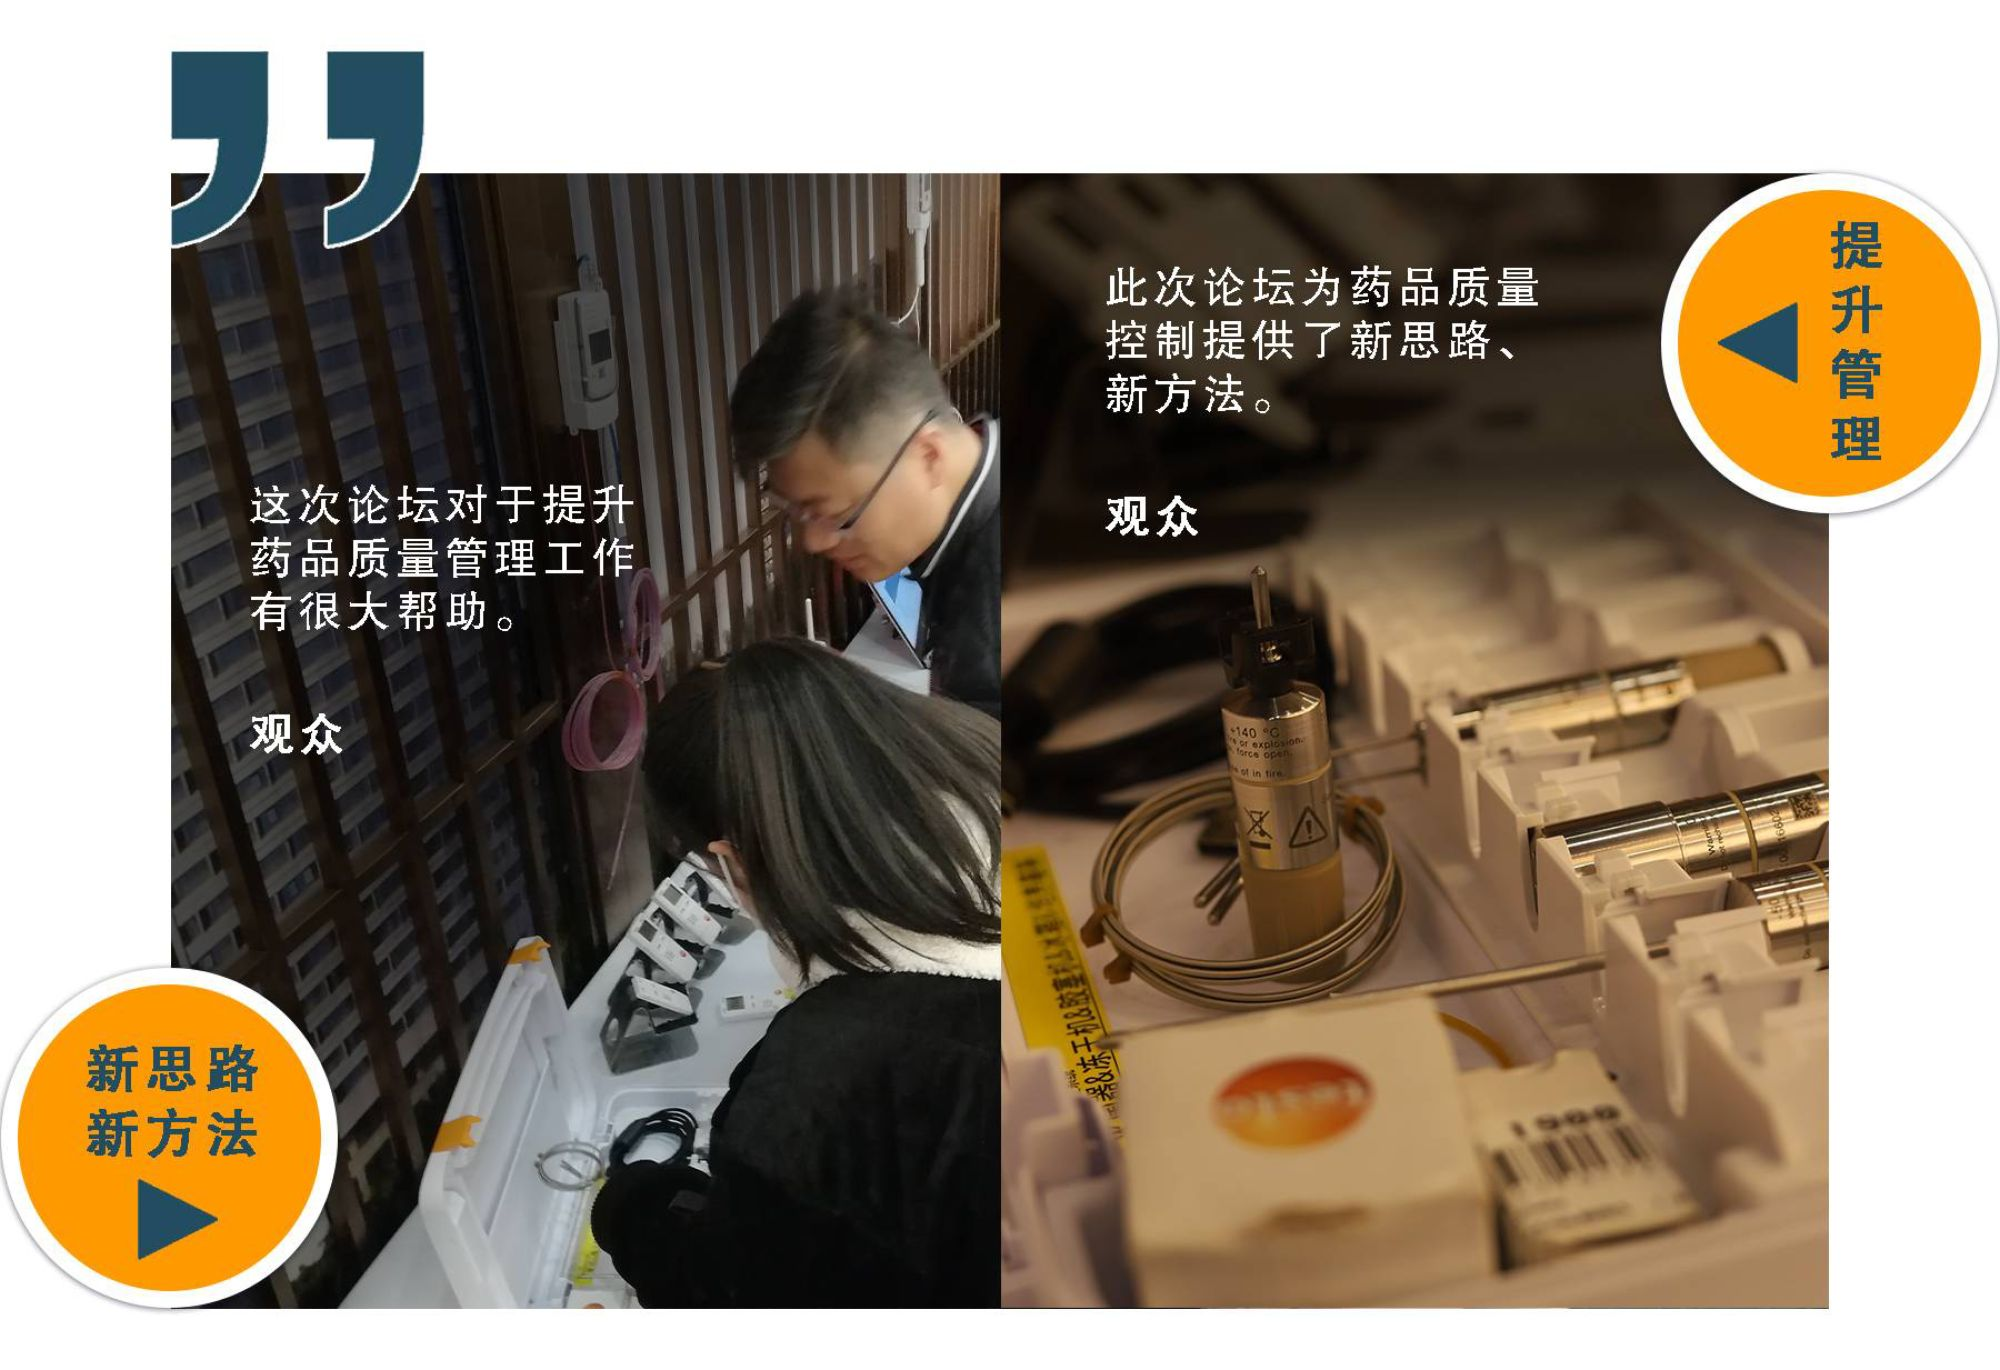 CN_20210325_Pharma_Event_news_testo-DIQC-202104.jpg